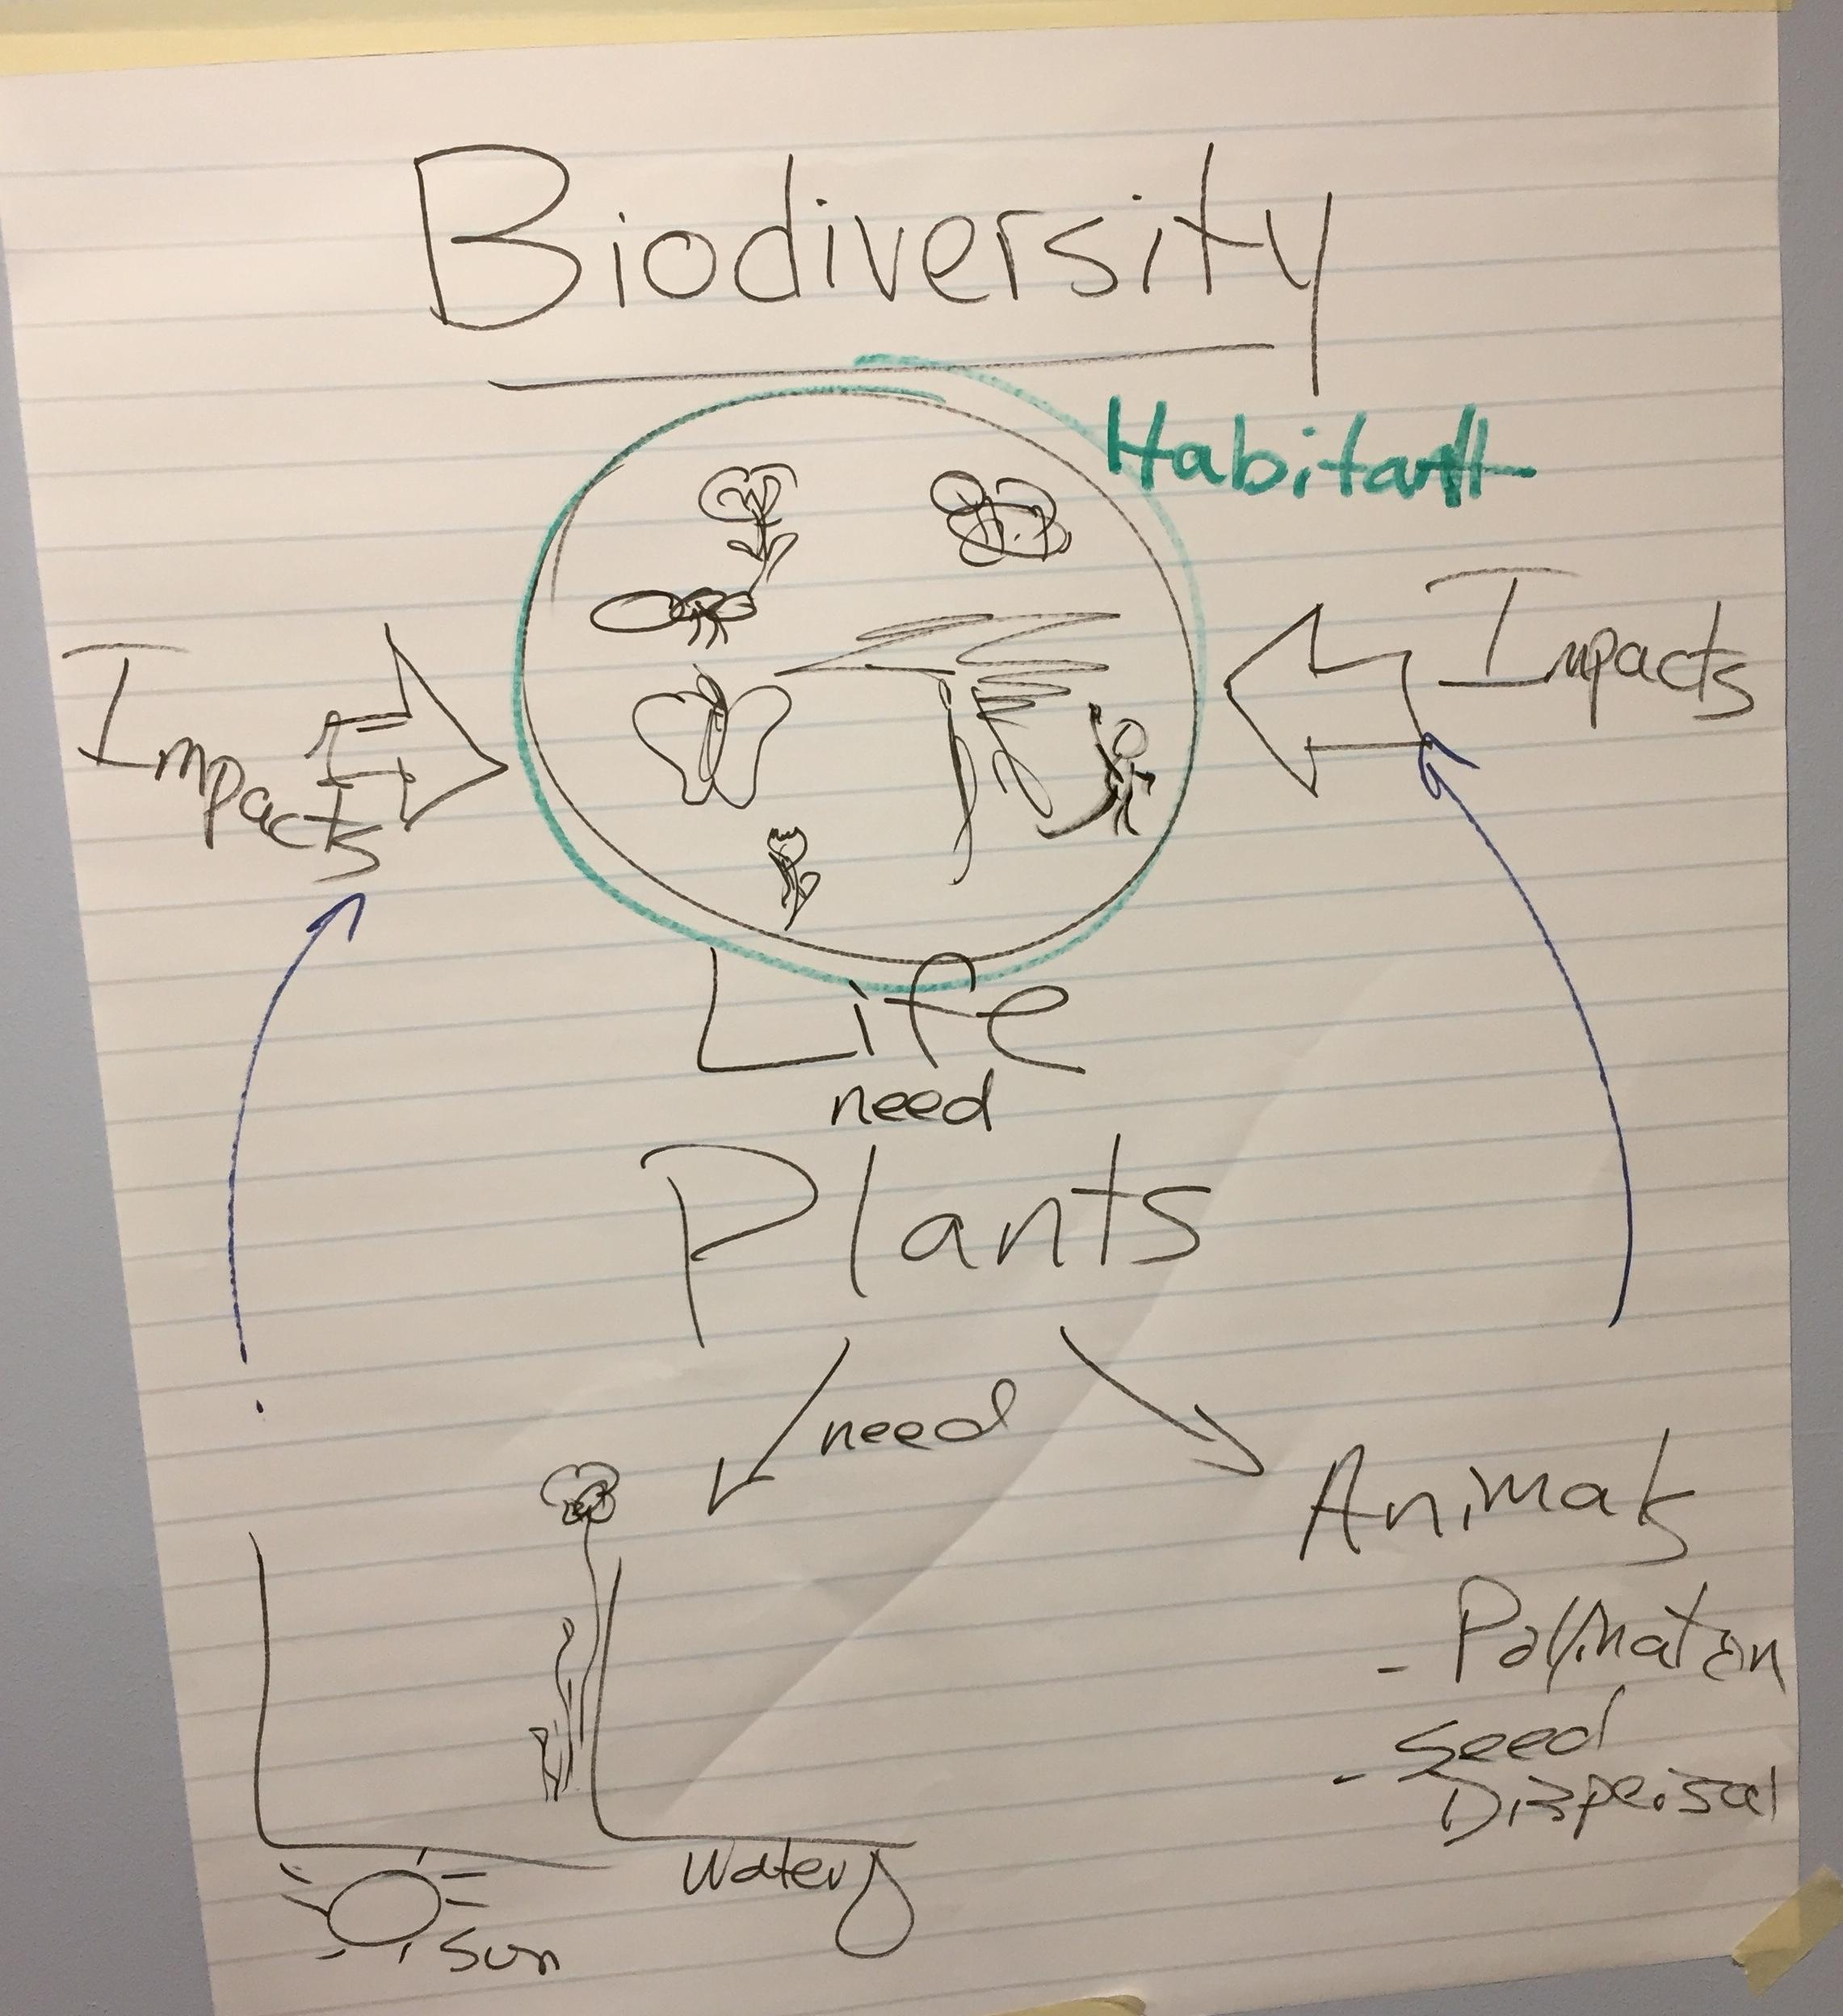 2 Biodiversity and Ecosystems.JPG